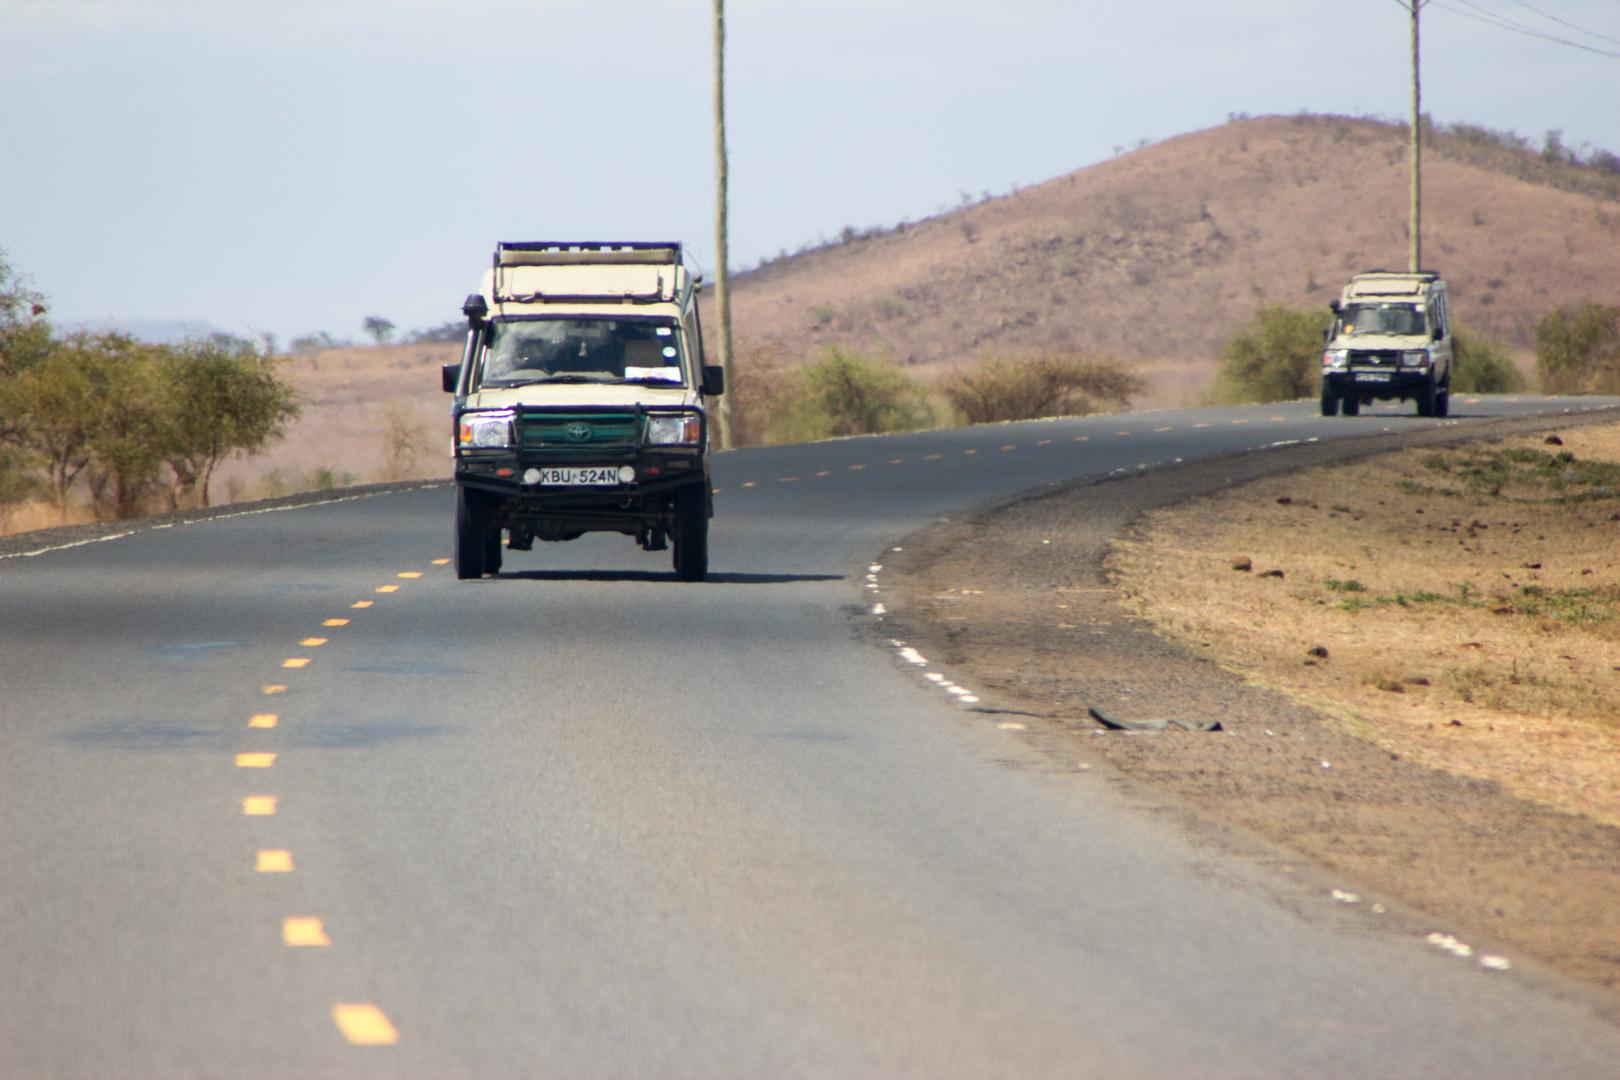 Carretera hacia Amboseli, Kenia